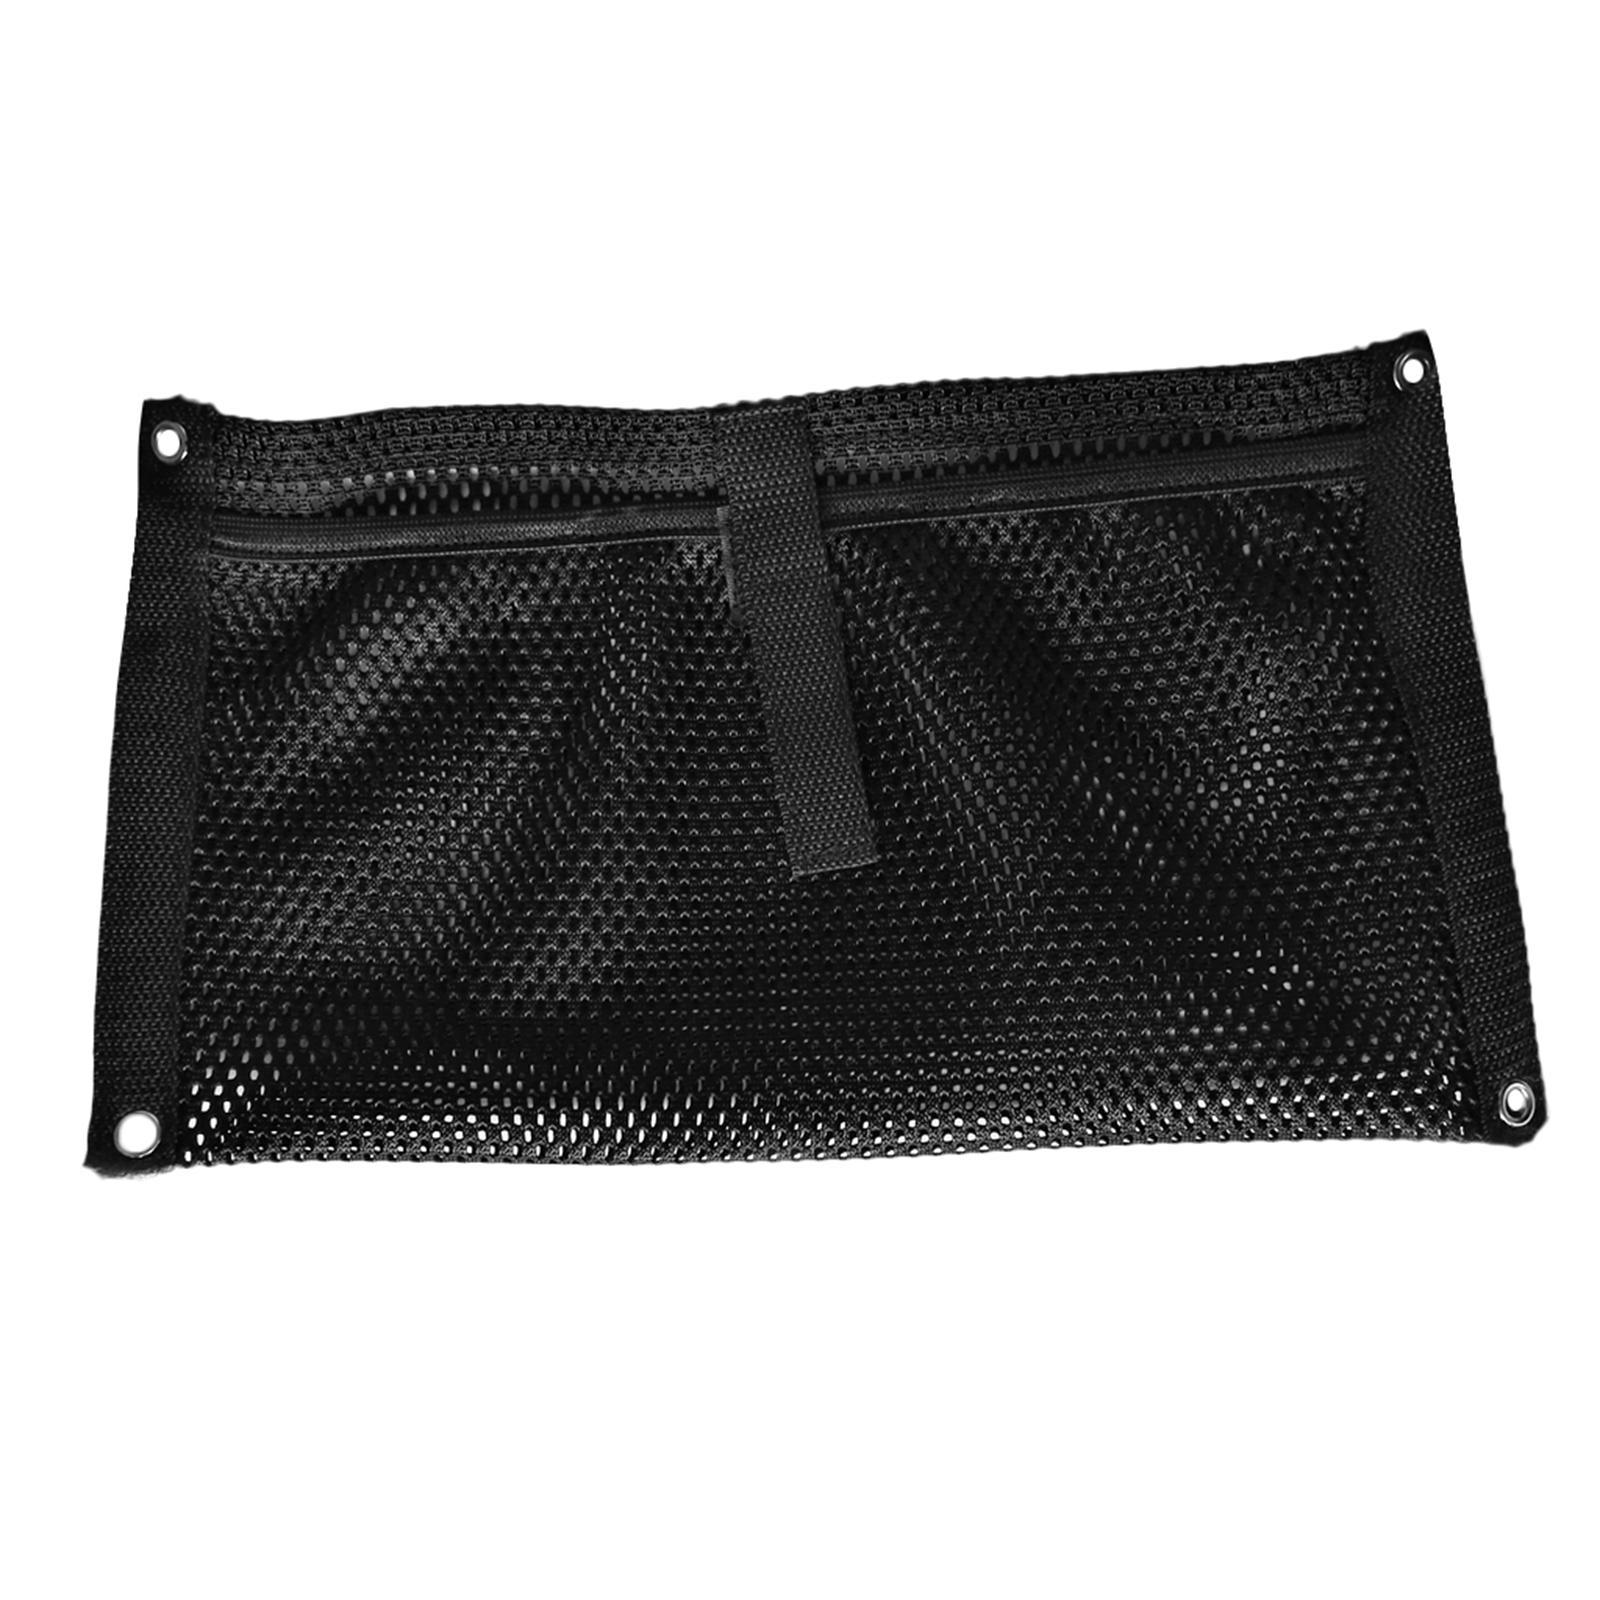 Boat Storage Netting : Black nylon boat gear accessories beer storage mesh bag